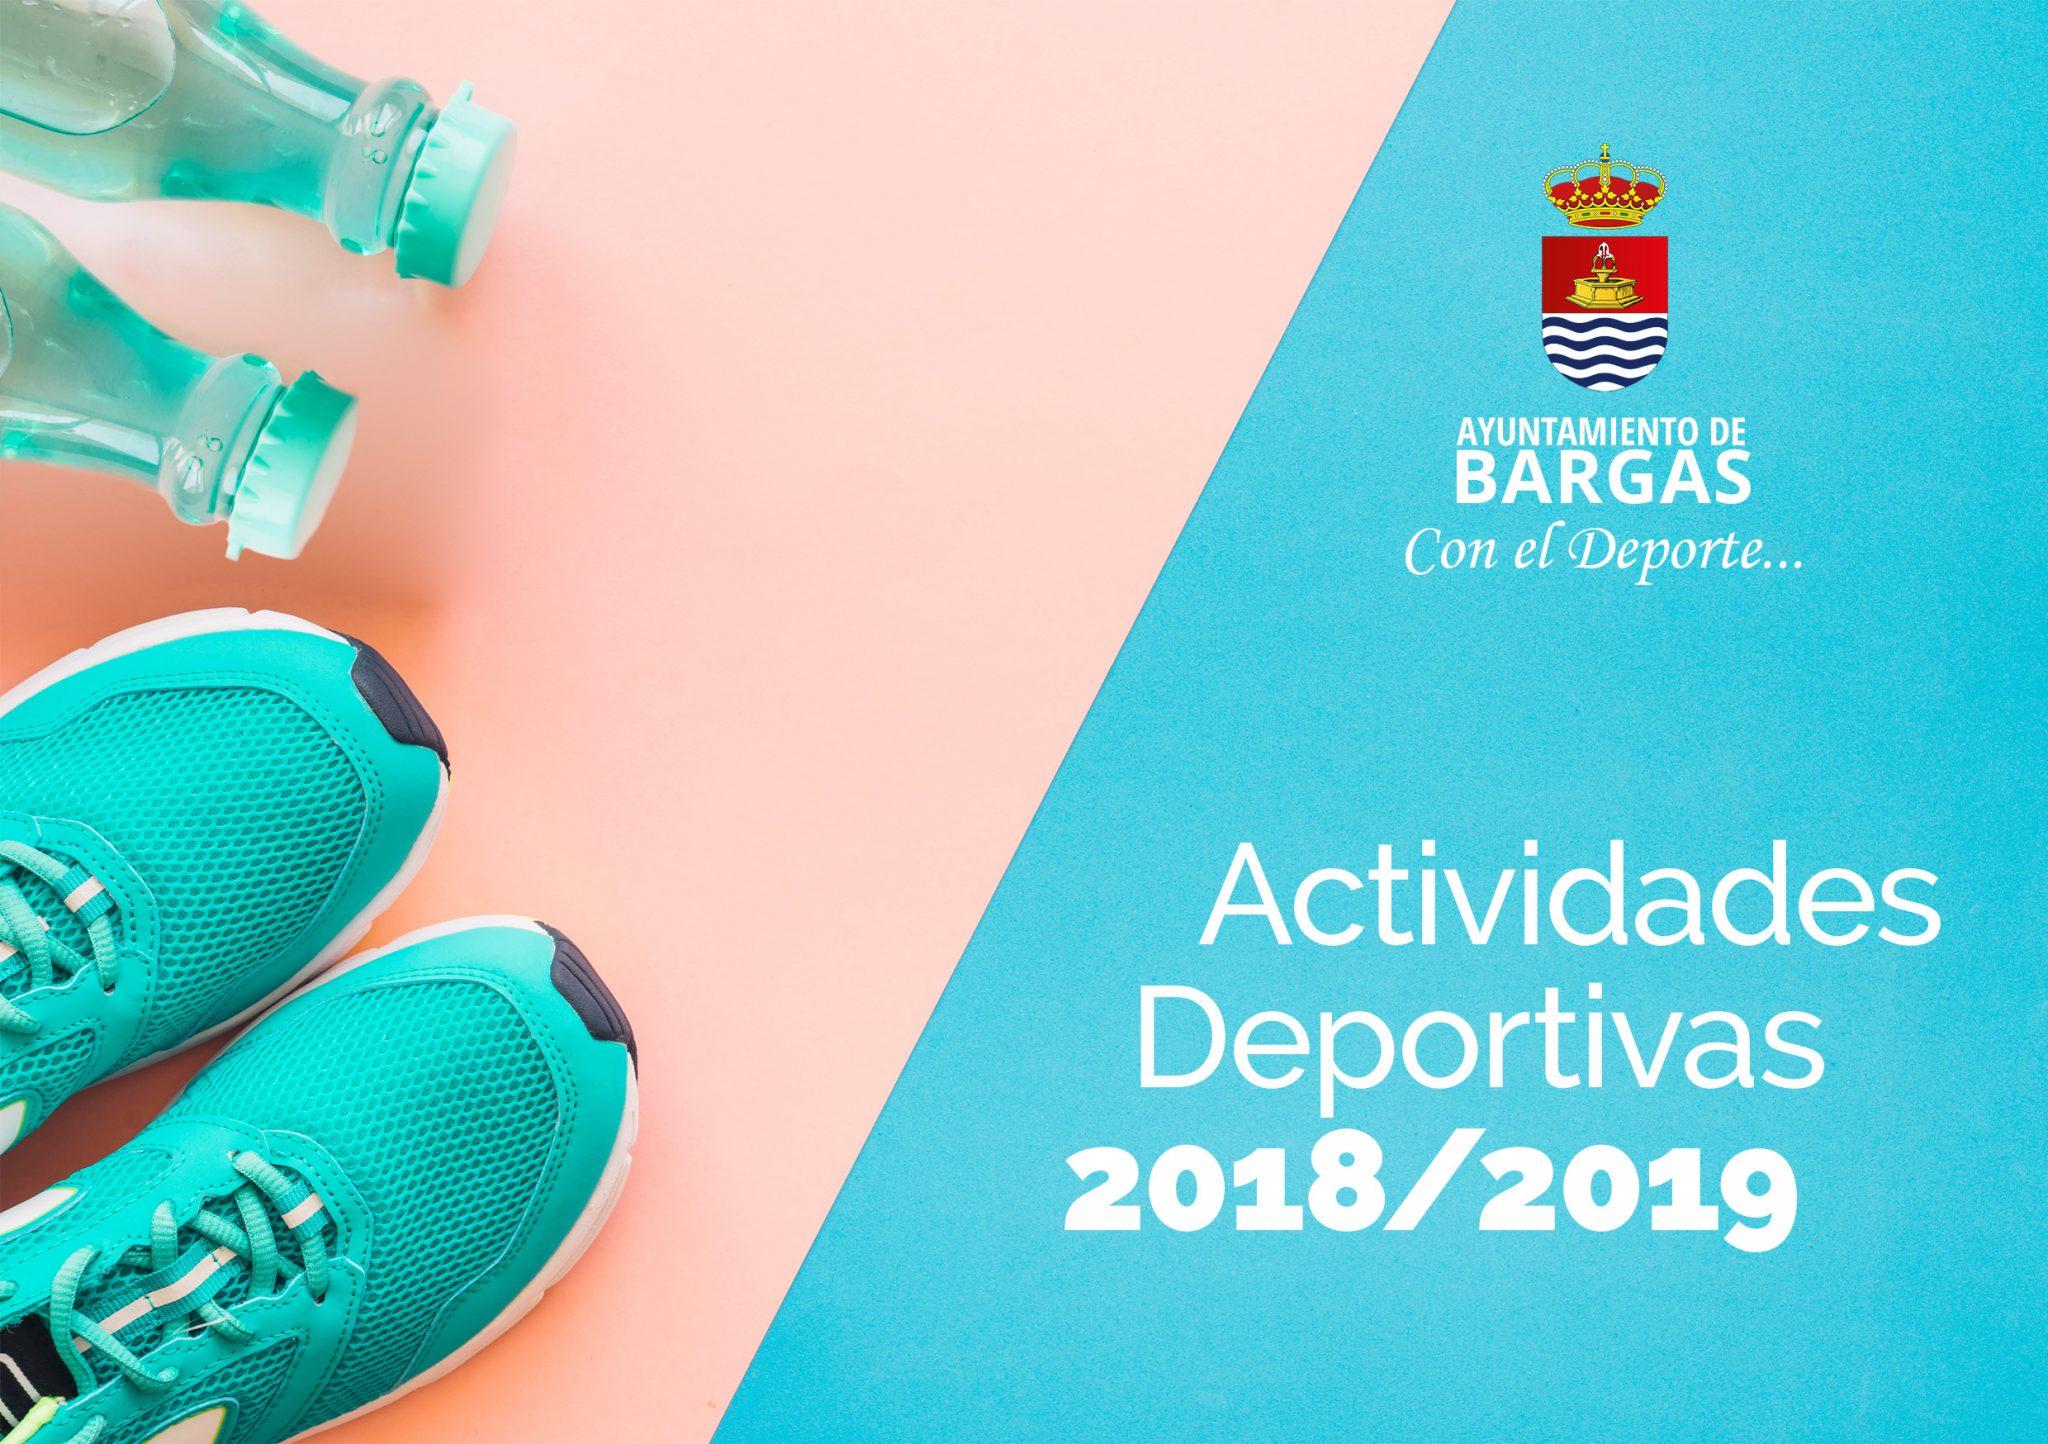 Actividades Deportivas 2018/2019